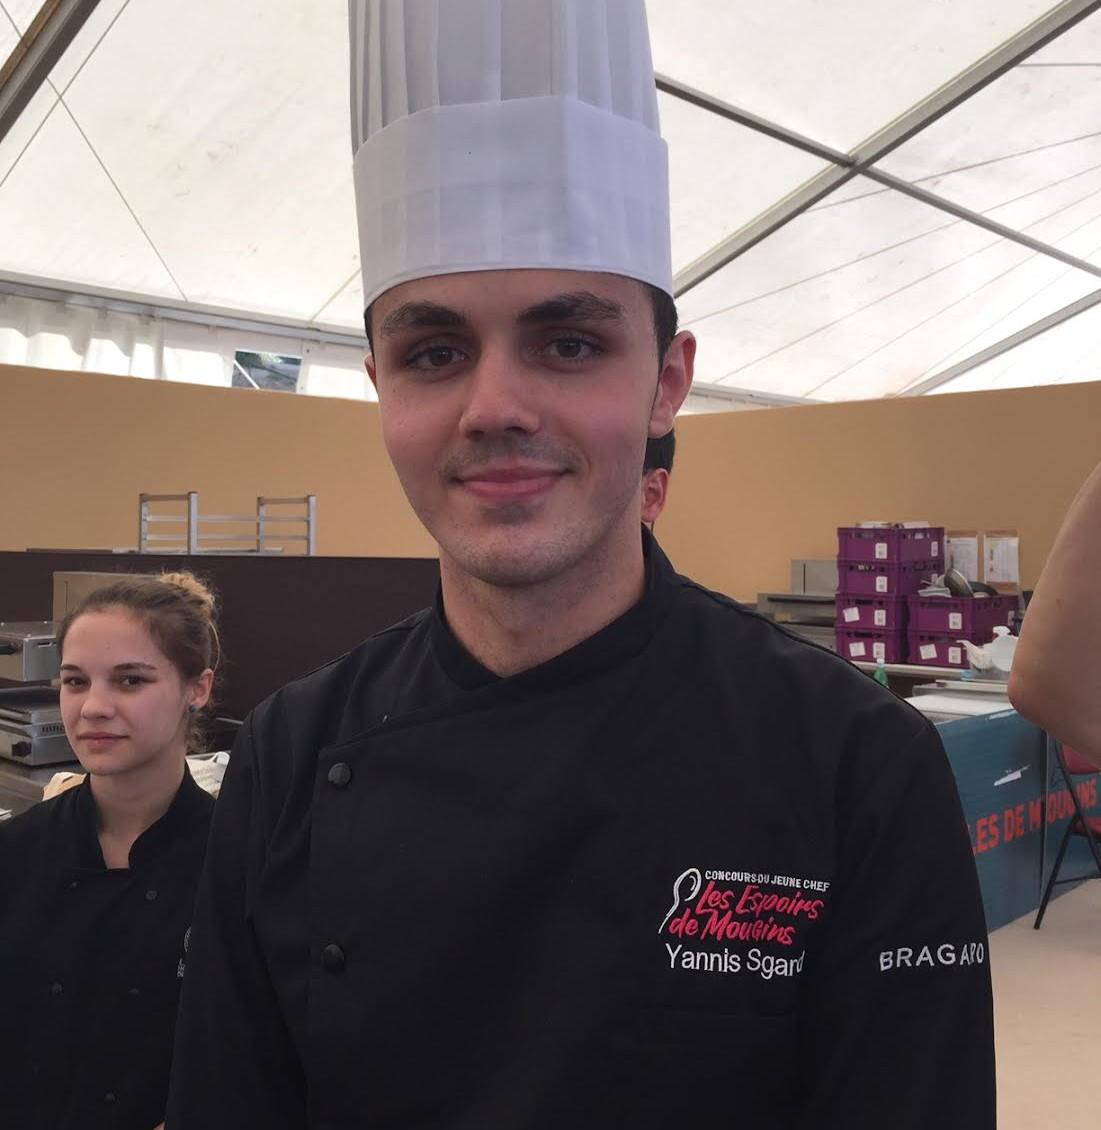 SGARD Yannis jeune chef mougins 2017